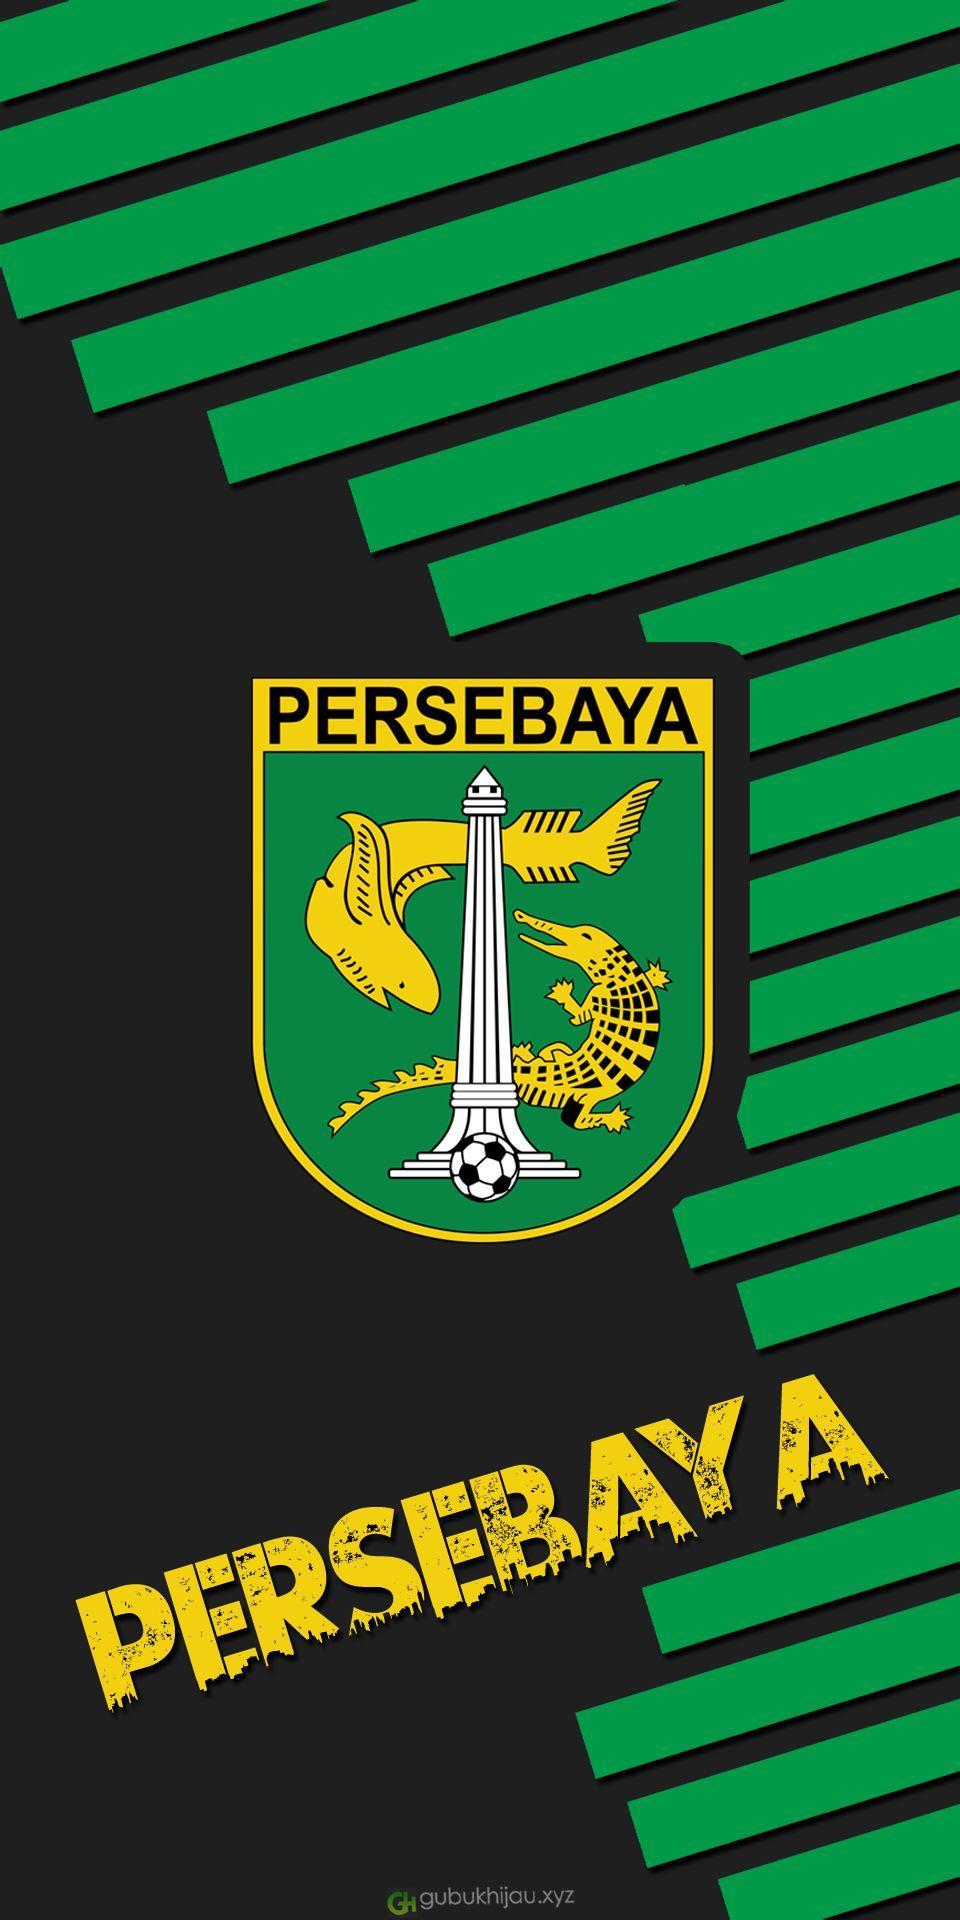 Logo Persebaya Android Wallpapers Wallpaper Cave